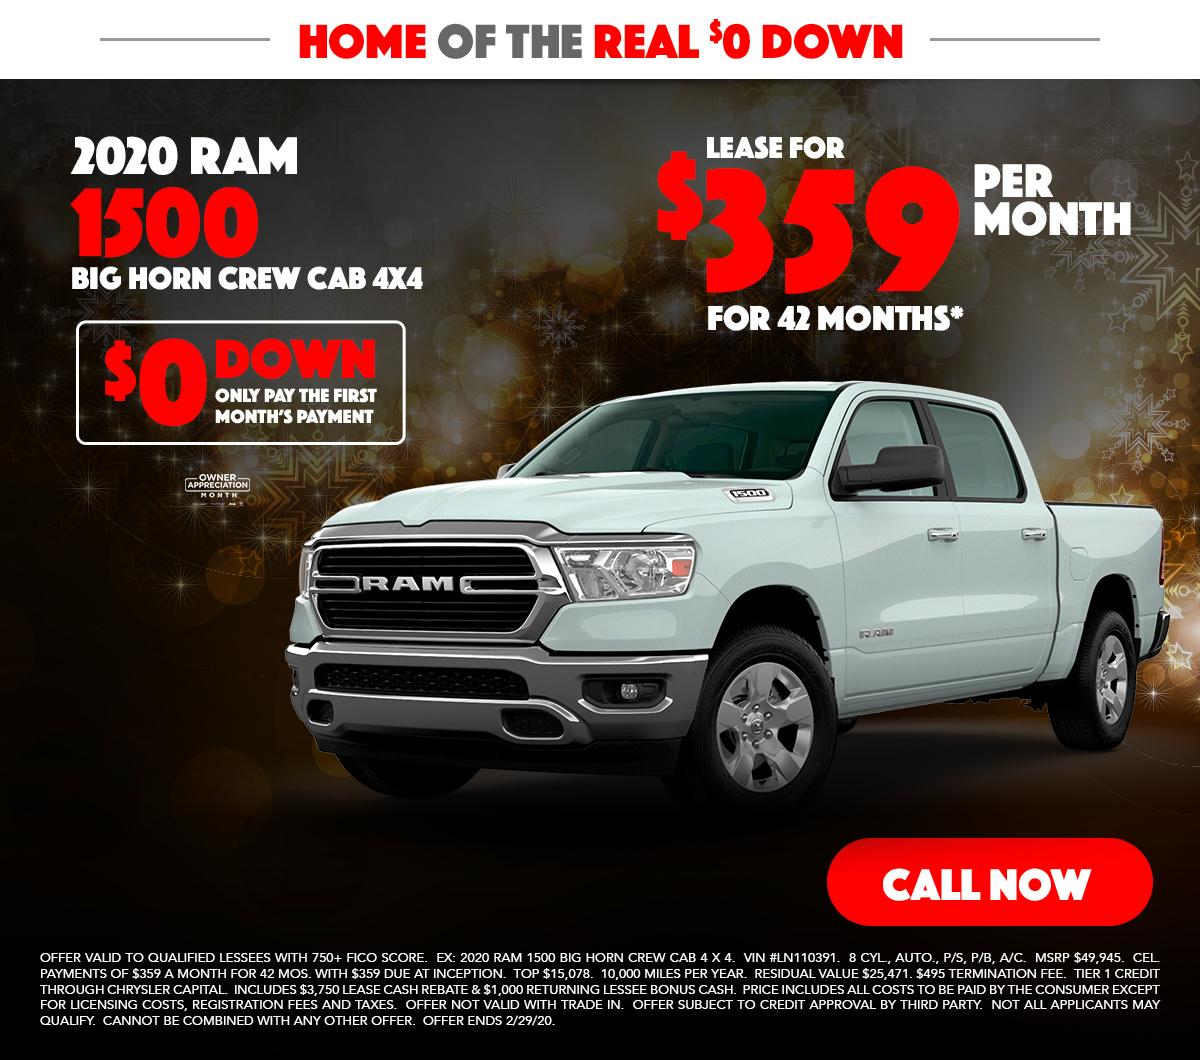 Dodge Dealers In Nj >> Cherry Hill Dodge Chrysler Jeep Ram Dealer In New Jersey